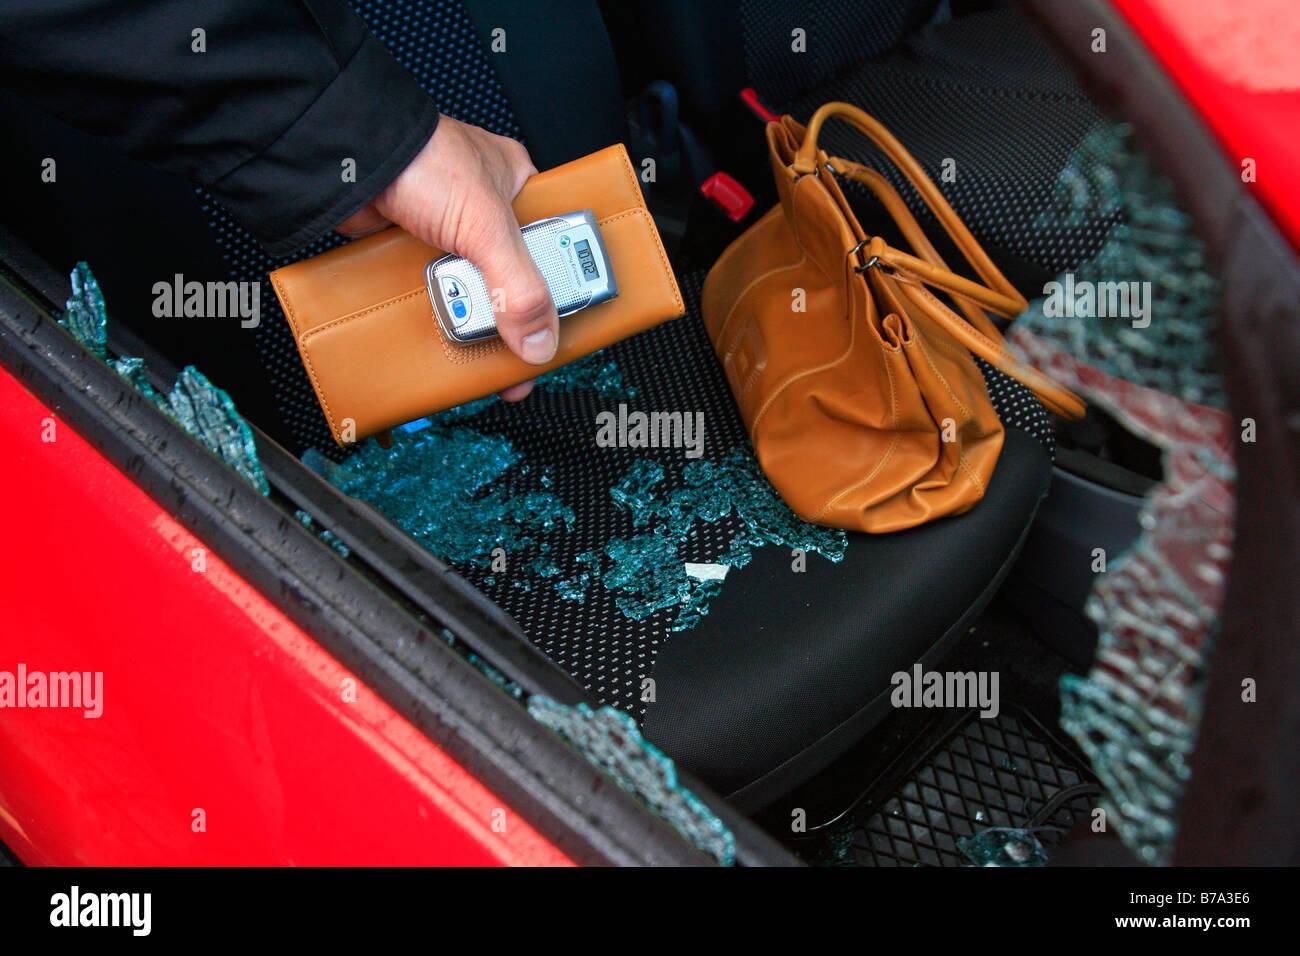 Car burglary, hand grasps through the side window at valuables, i.e. handbag, purse and mobile phone - Stock Image